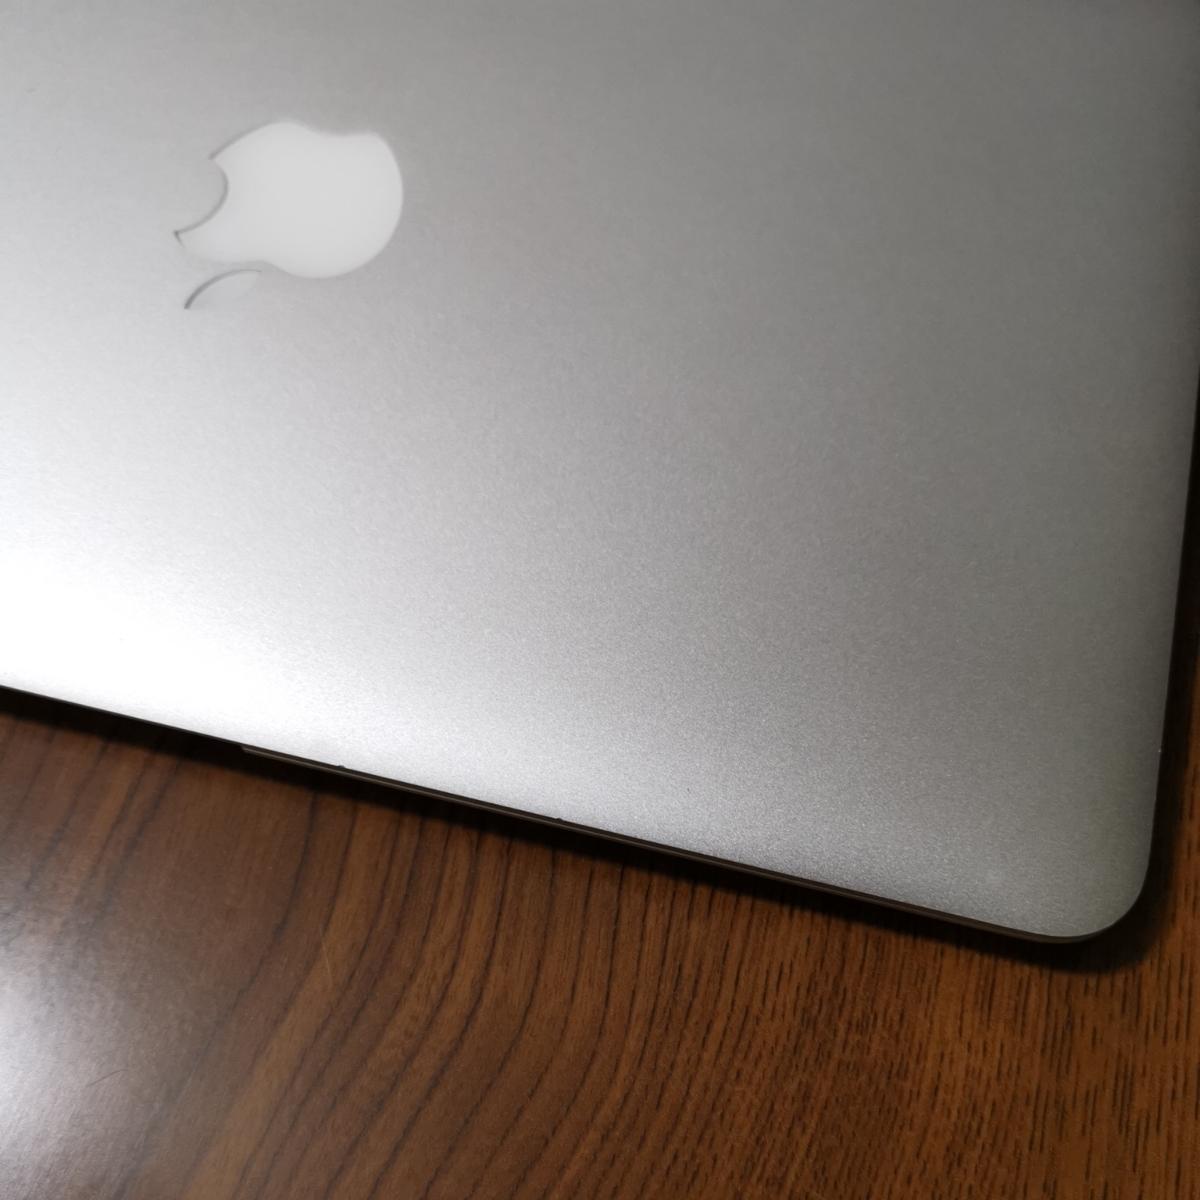 Apple MacBook Air 11インチ 2012 i5 4GB 128GB Mojave 動作確認済み 美品 Mac アップル SSD_画像6